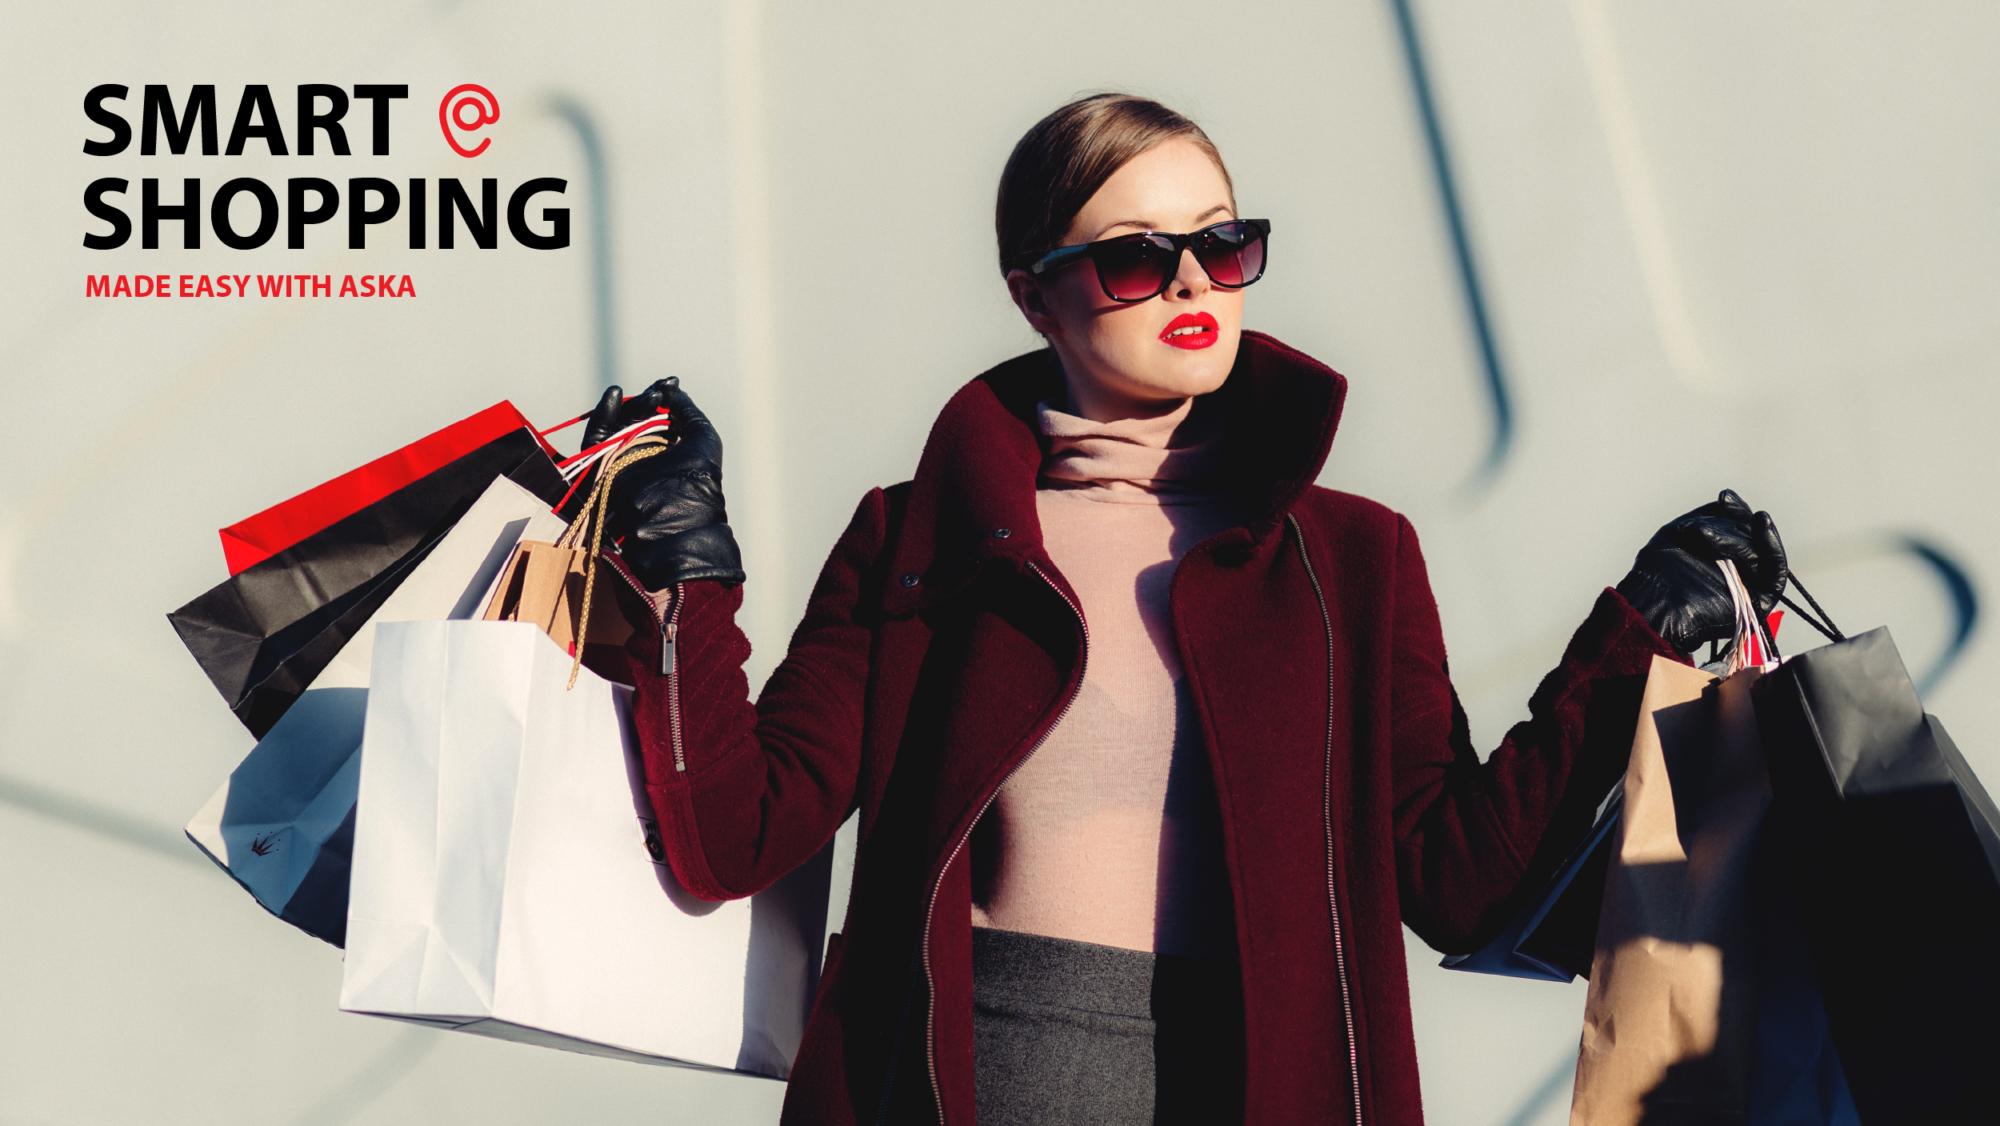 Aska Smart Shopping